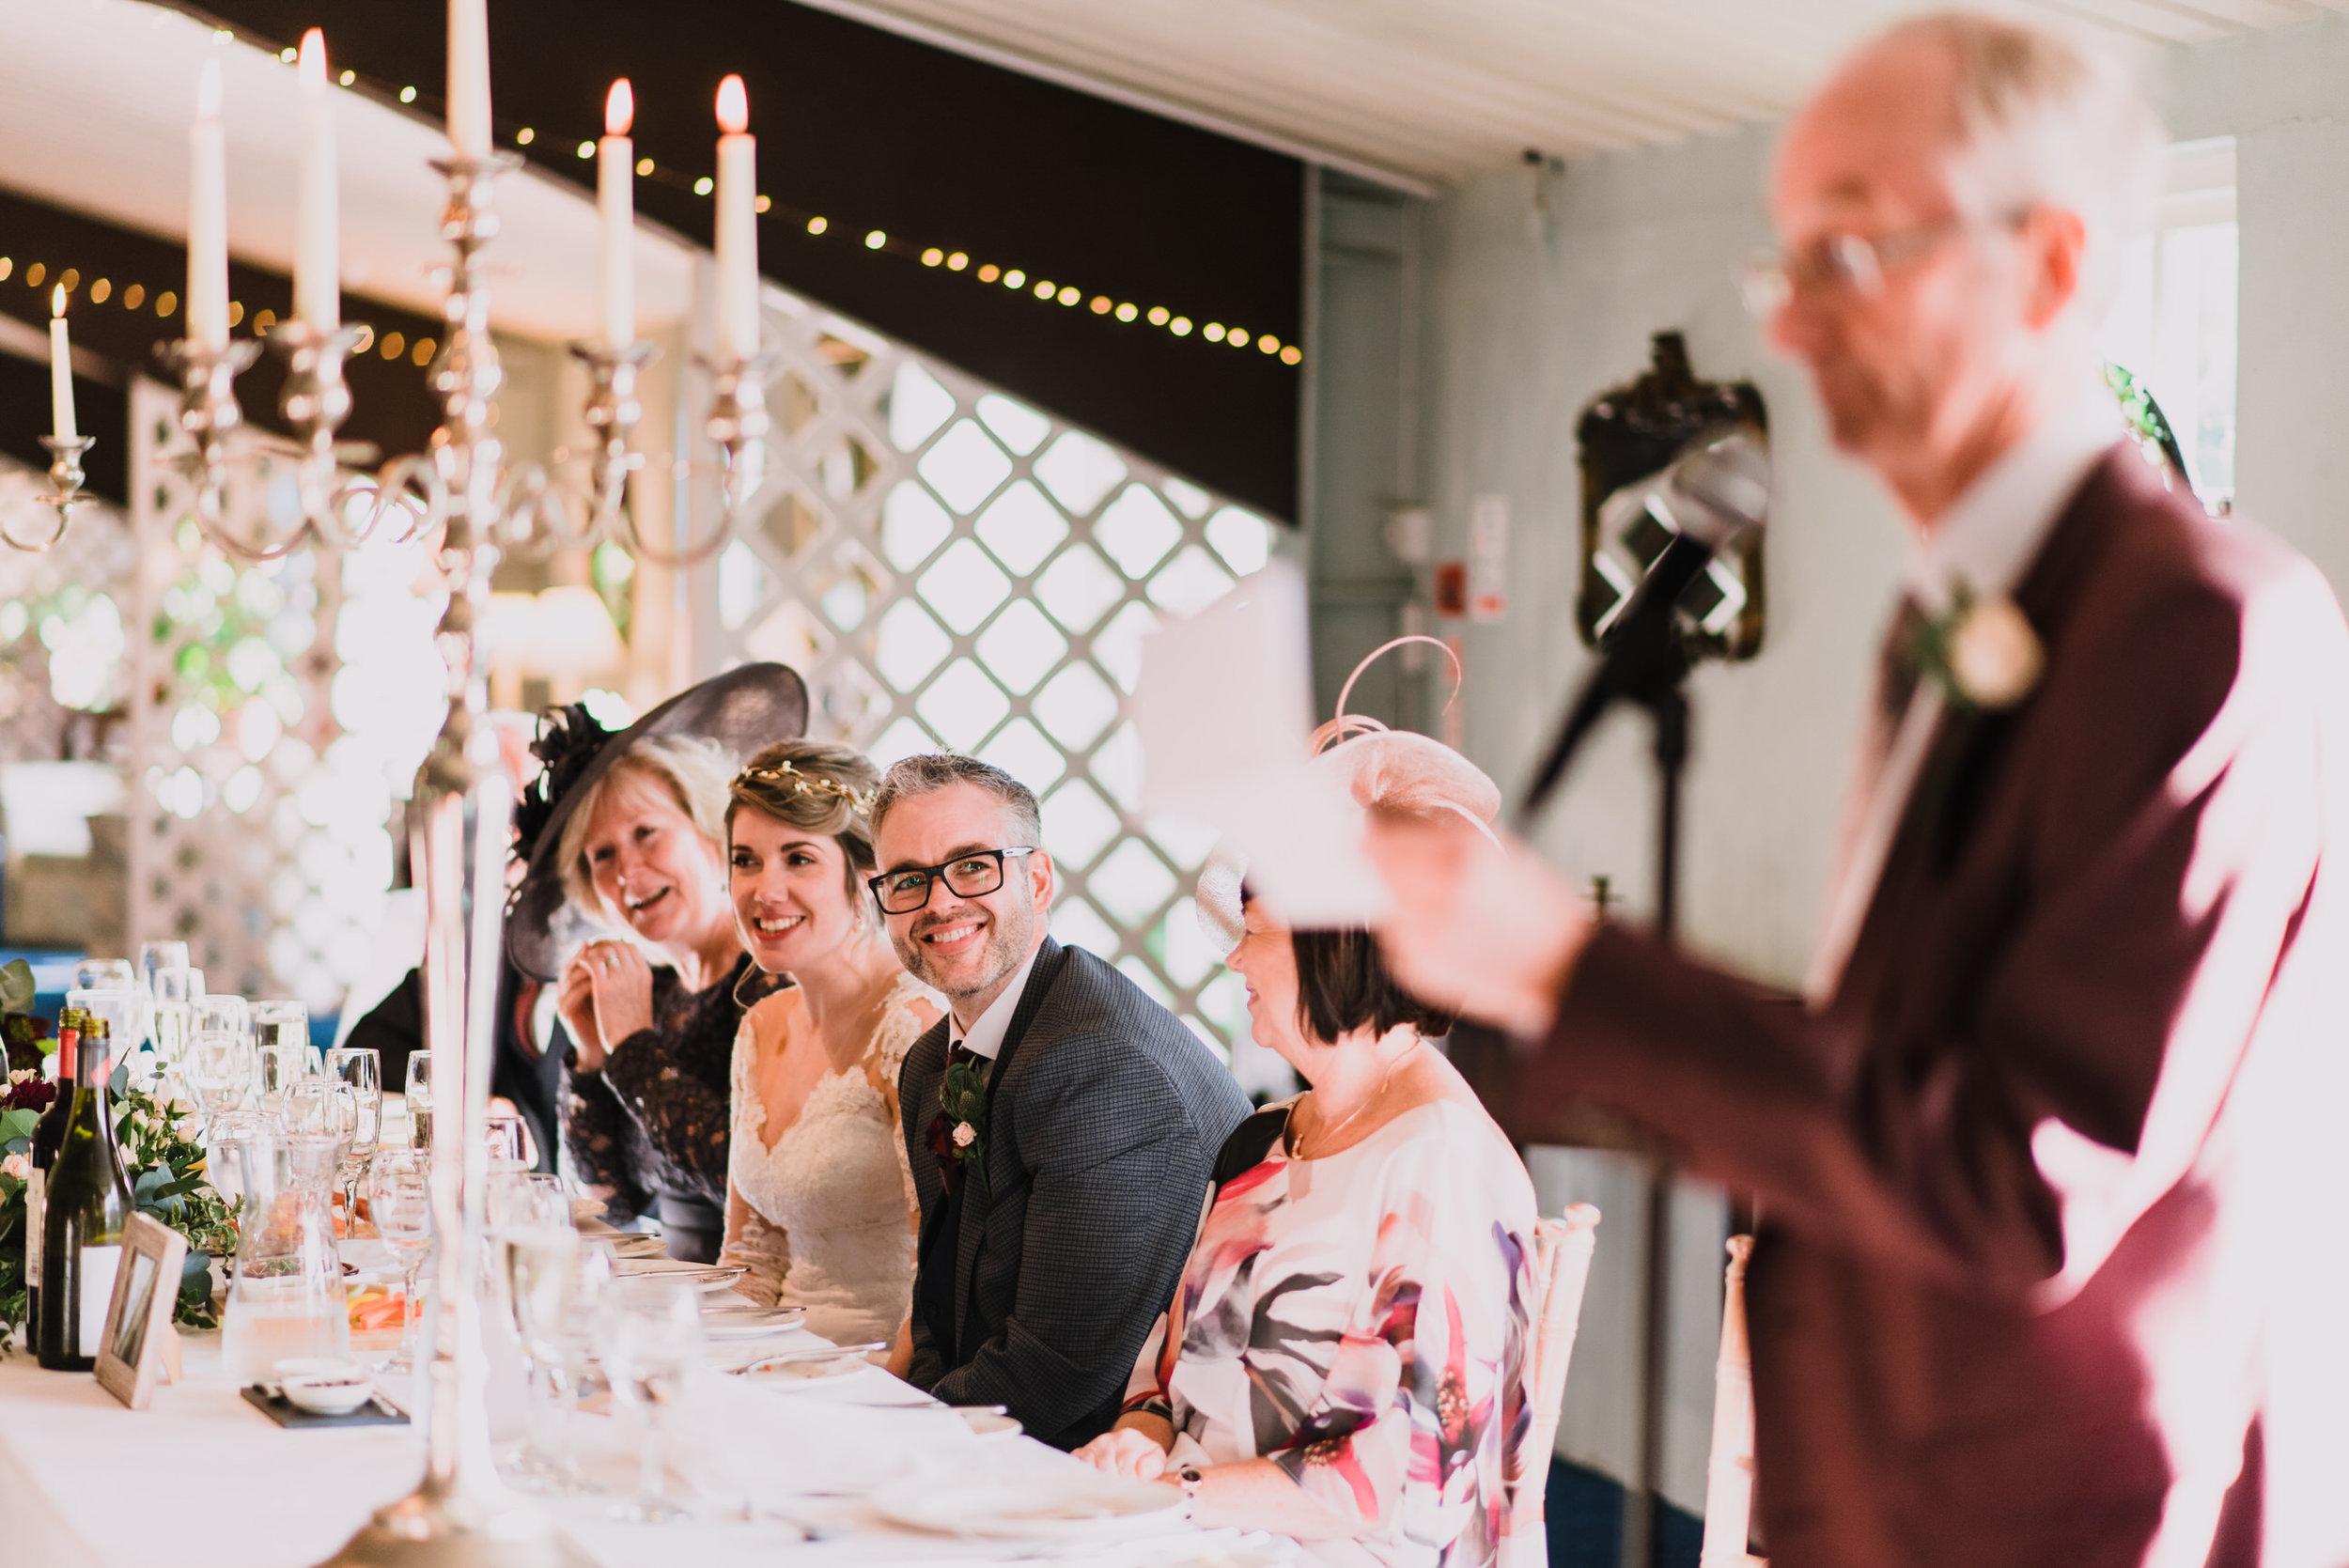 lissanoure castle wedding, northern ireland wedding photographer, romantic northern irish wedding venue, castle wedding ireland, natural wedding photography ni (111).jpg